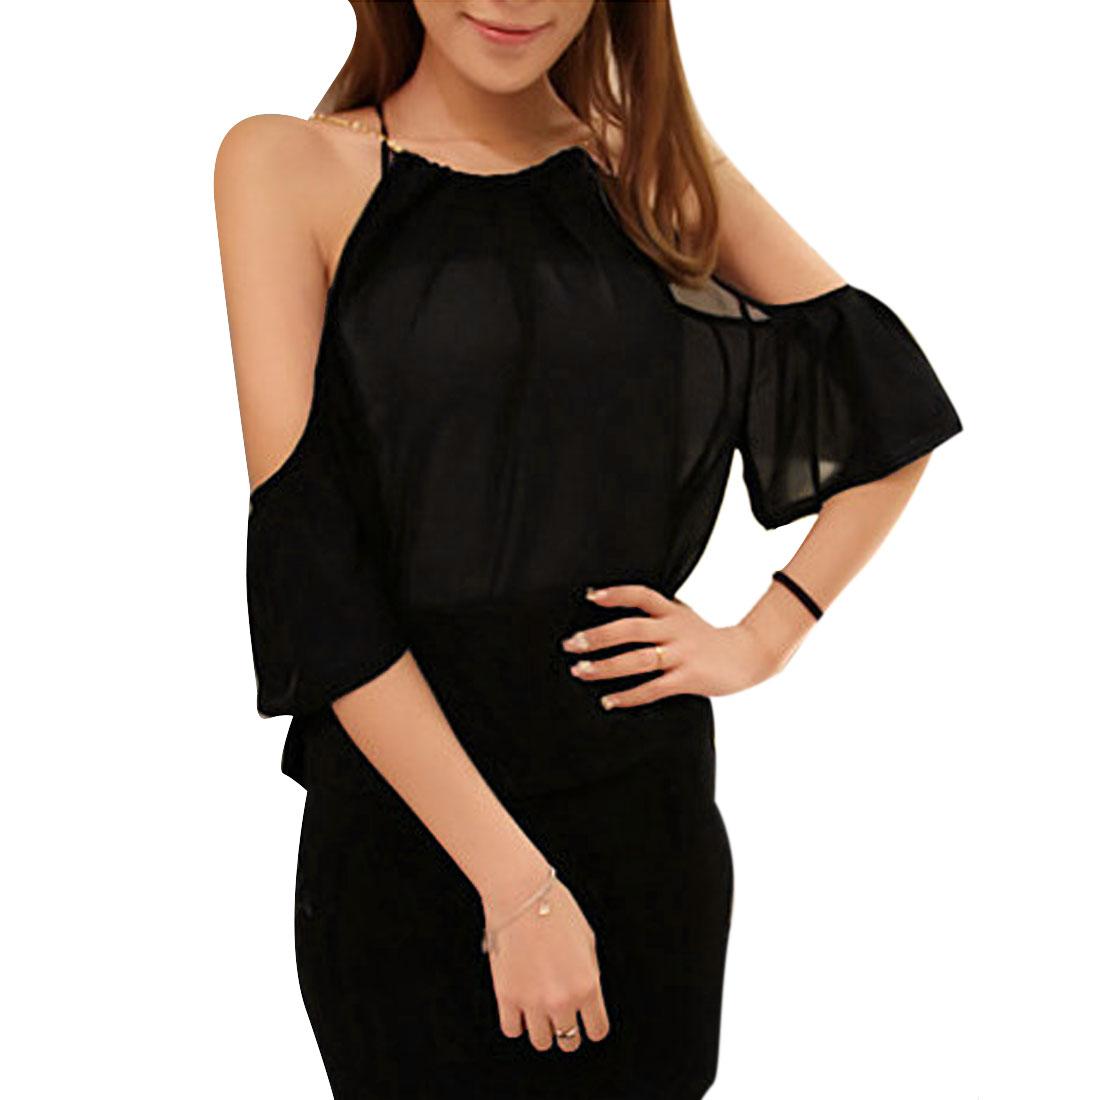 Women Scoop Neck Round Hem Semi Sheer Summer Casual Blouse Black S